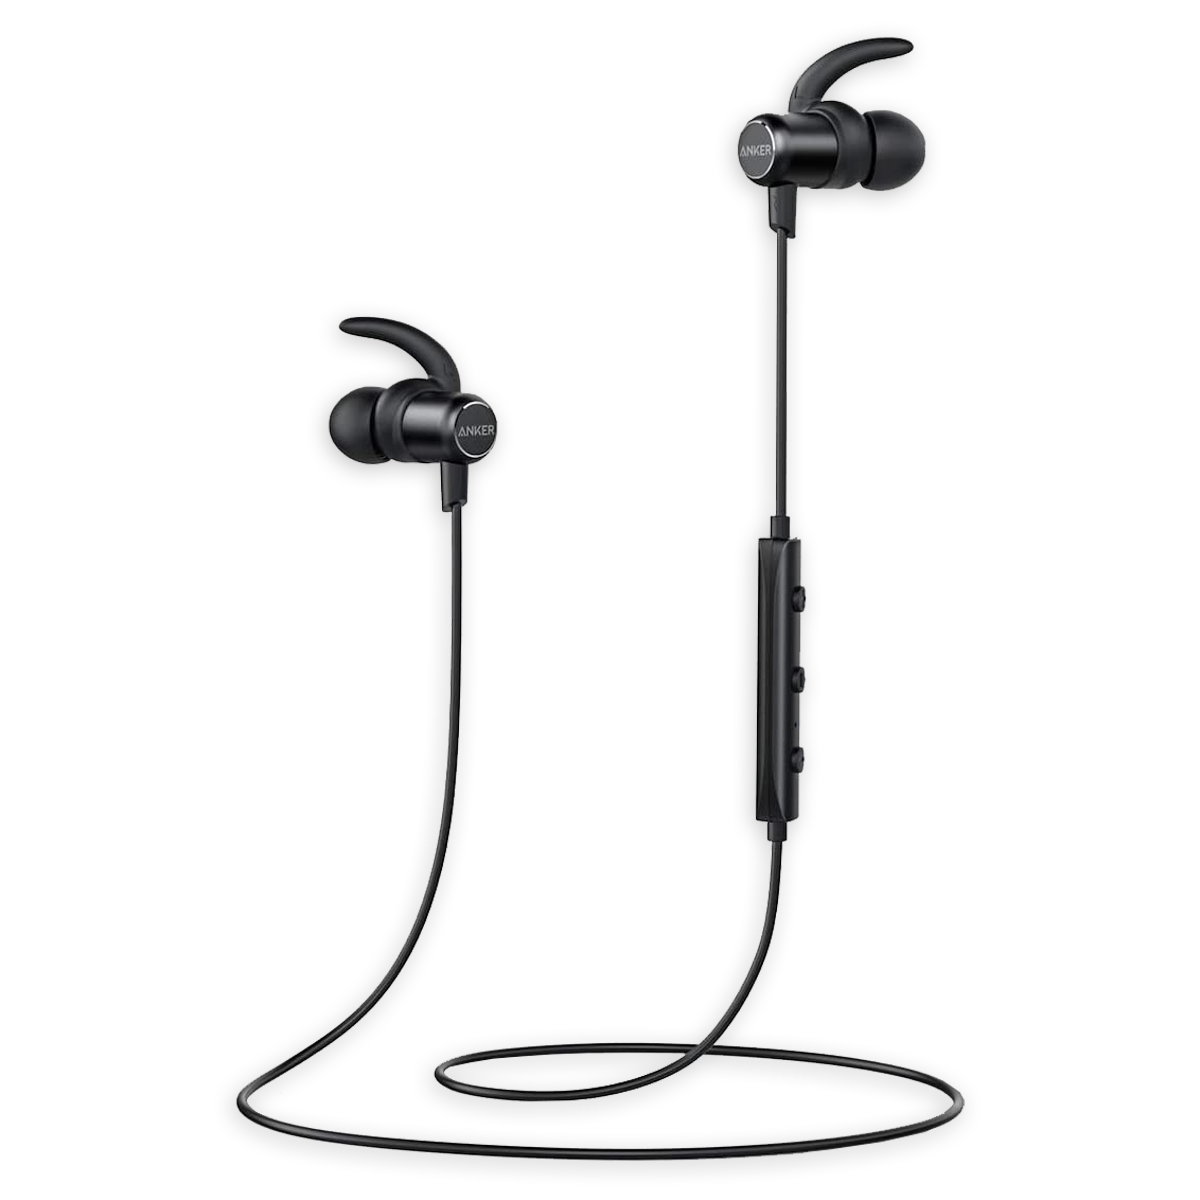 Anker SoundBuds Slim Wireless Bluetooth Headphones